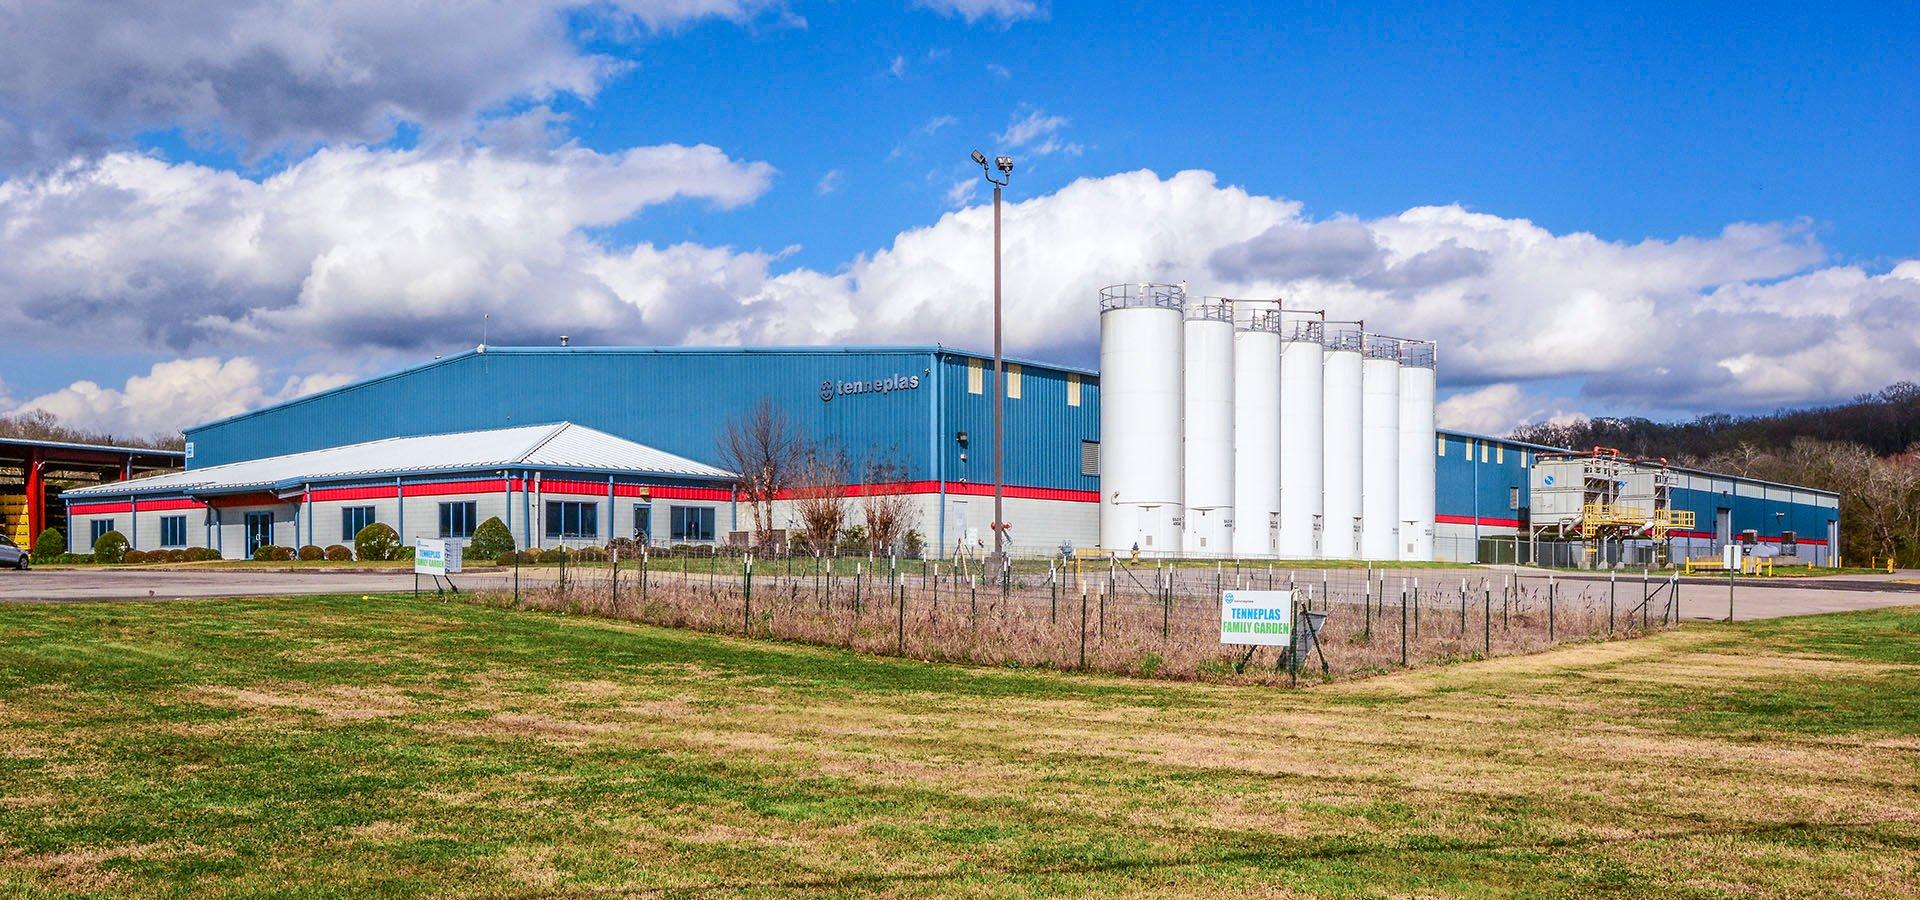 Tenneplas | Pulaski, Tennessee | Brindley Construction, LLC.